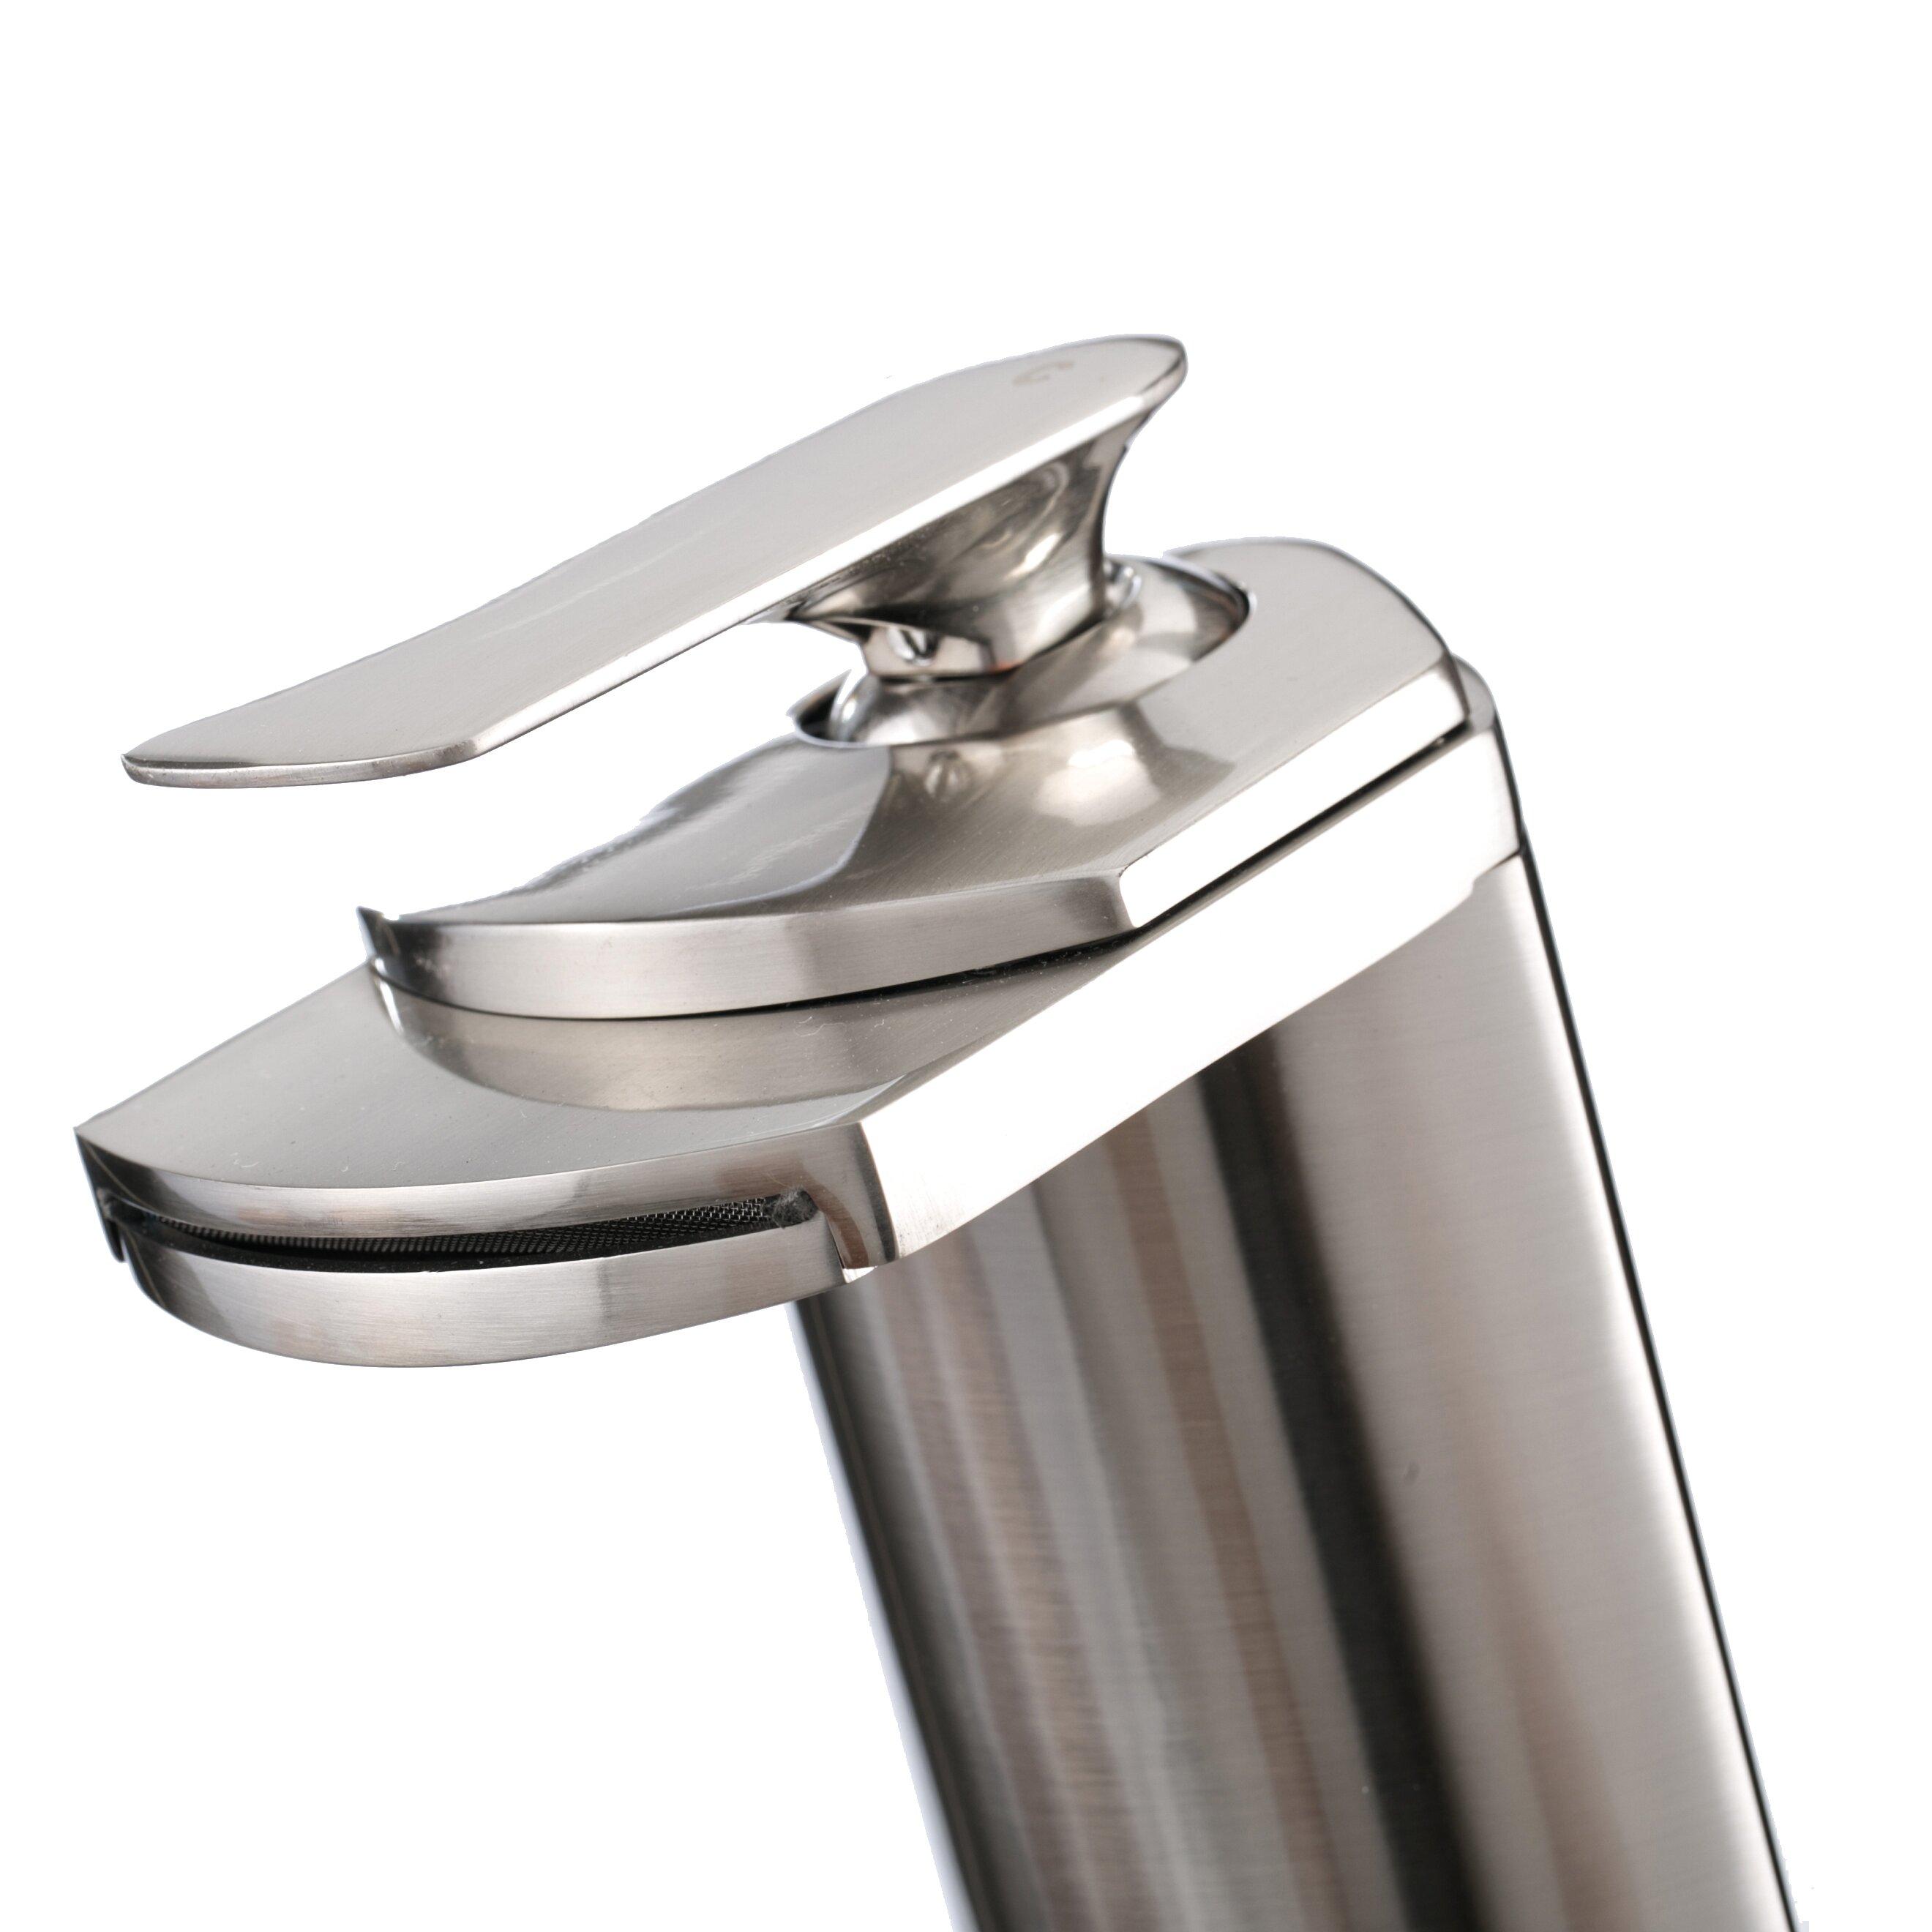 Kokols Single Handle Single Hole Vessel Bathroom Waterfall Faucet Reviews Wayfair